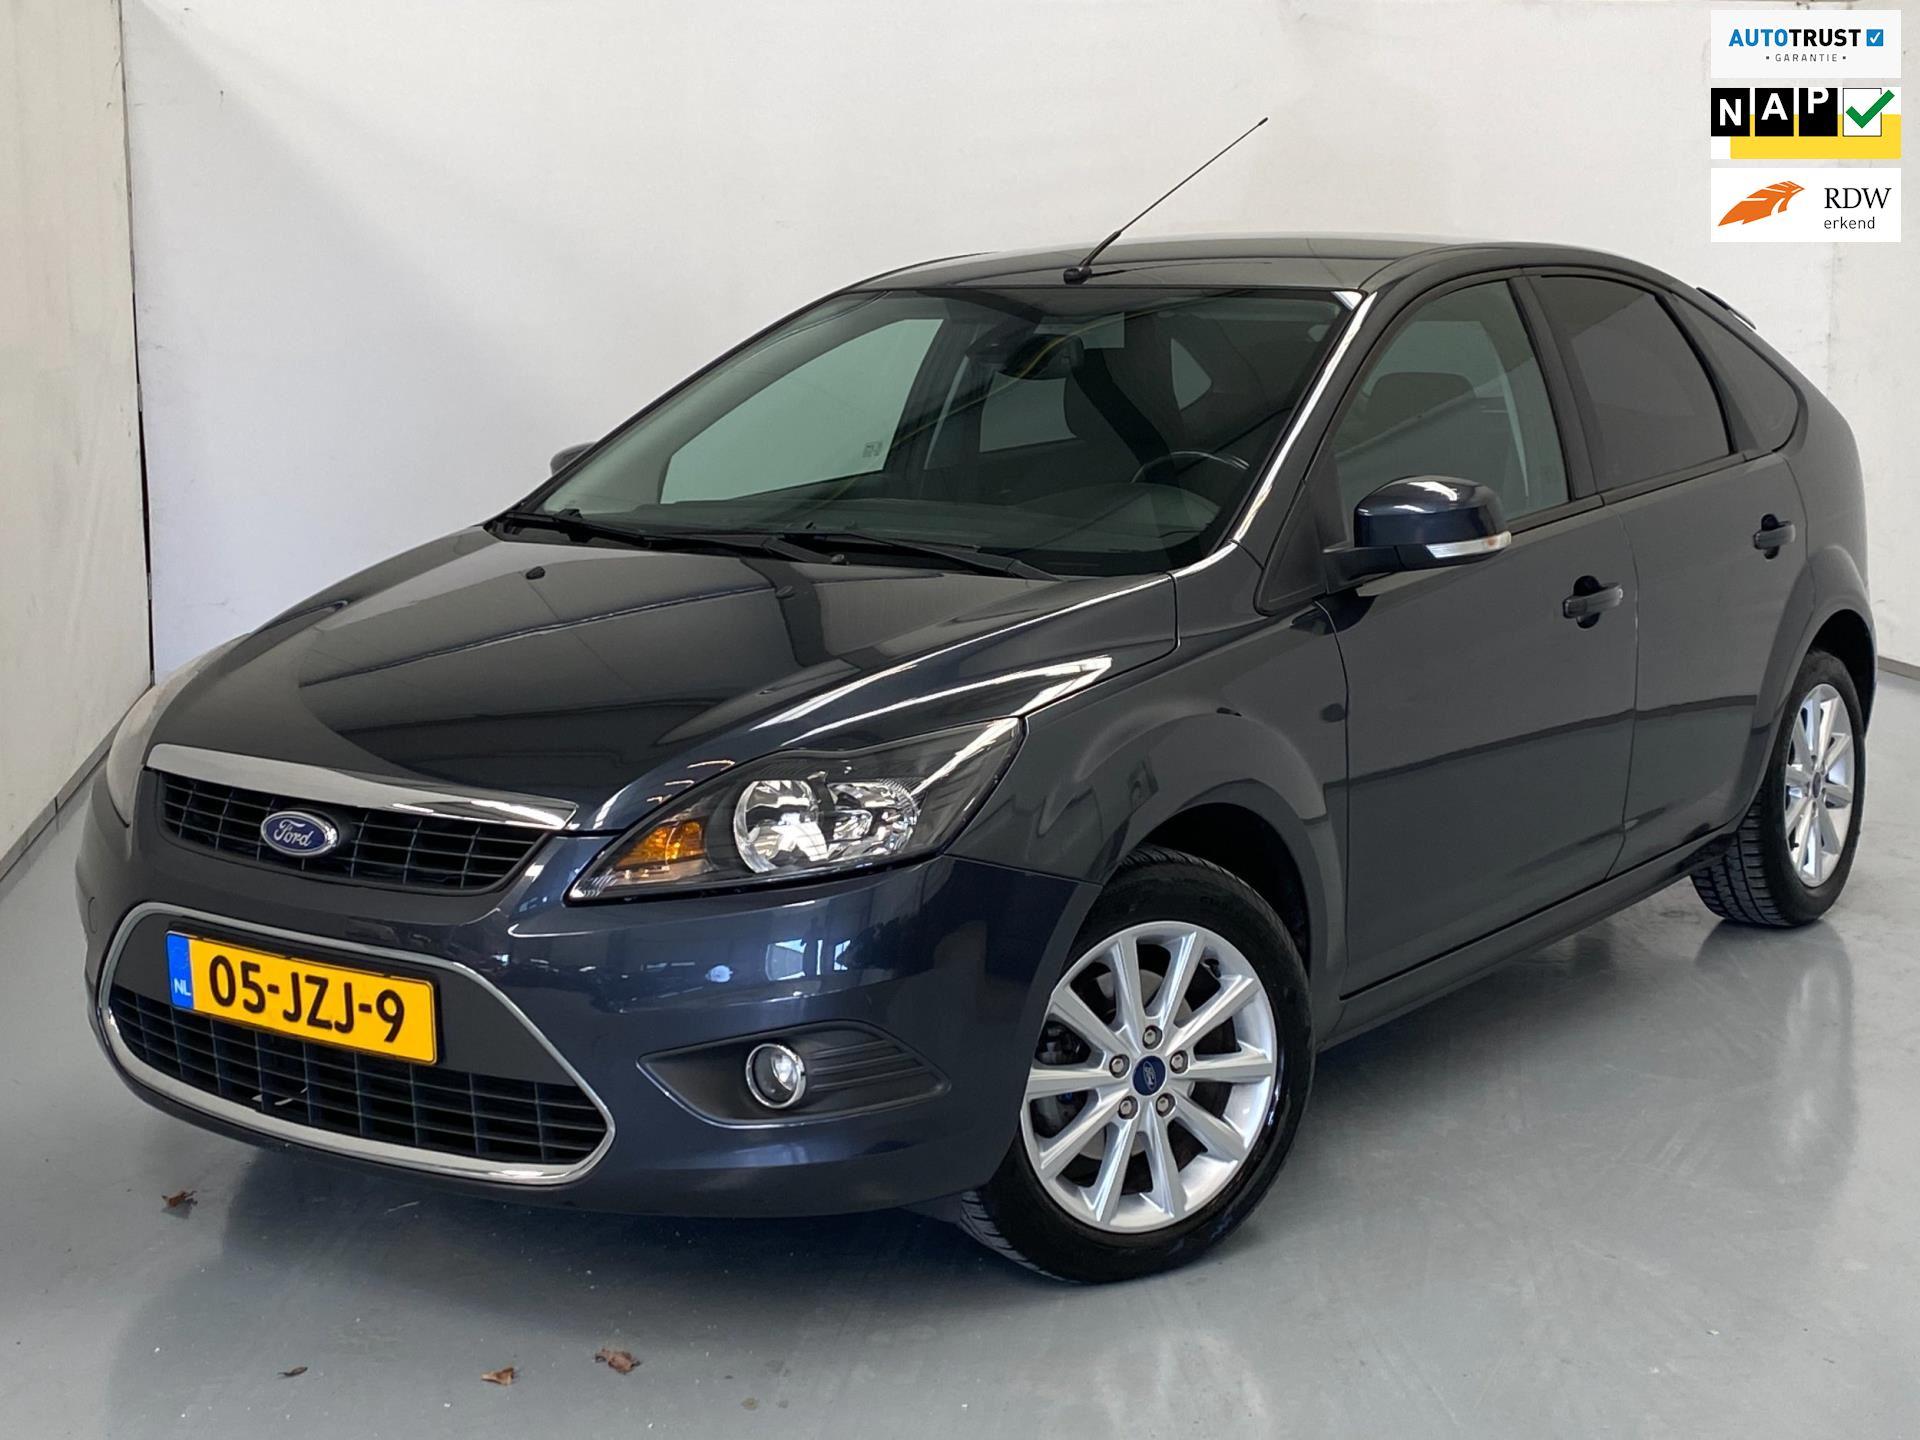 Ford Focus occasion - Van den Brink Auto's